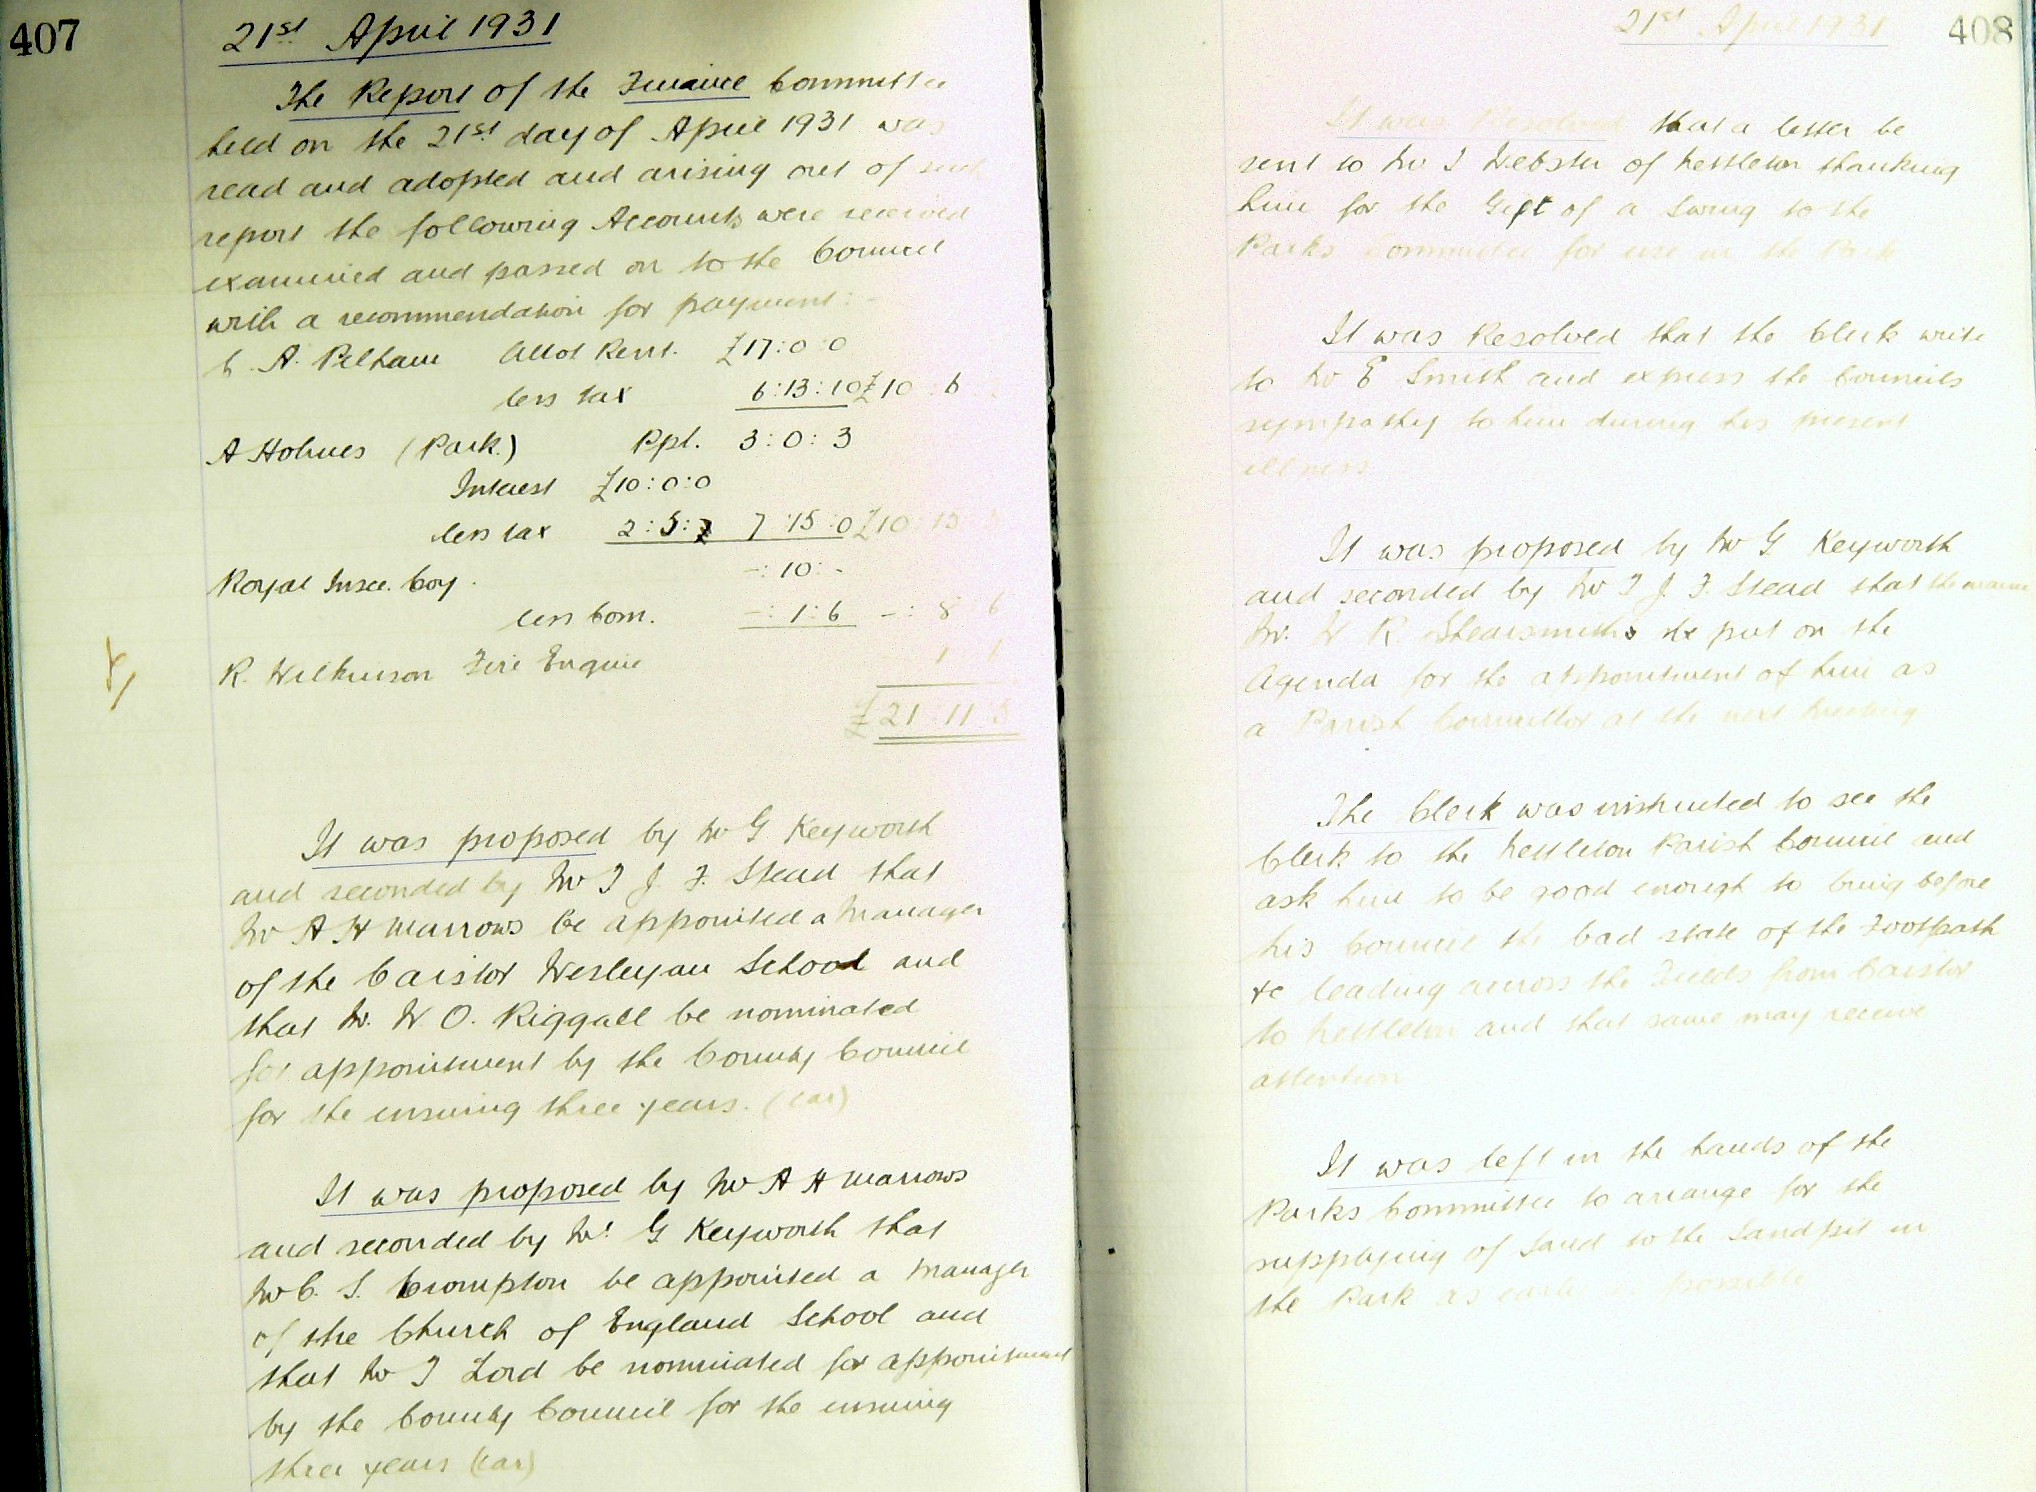 1931 04 21 b Parish Council.jpg